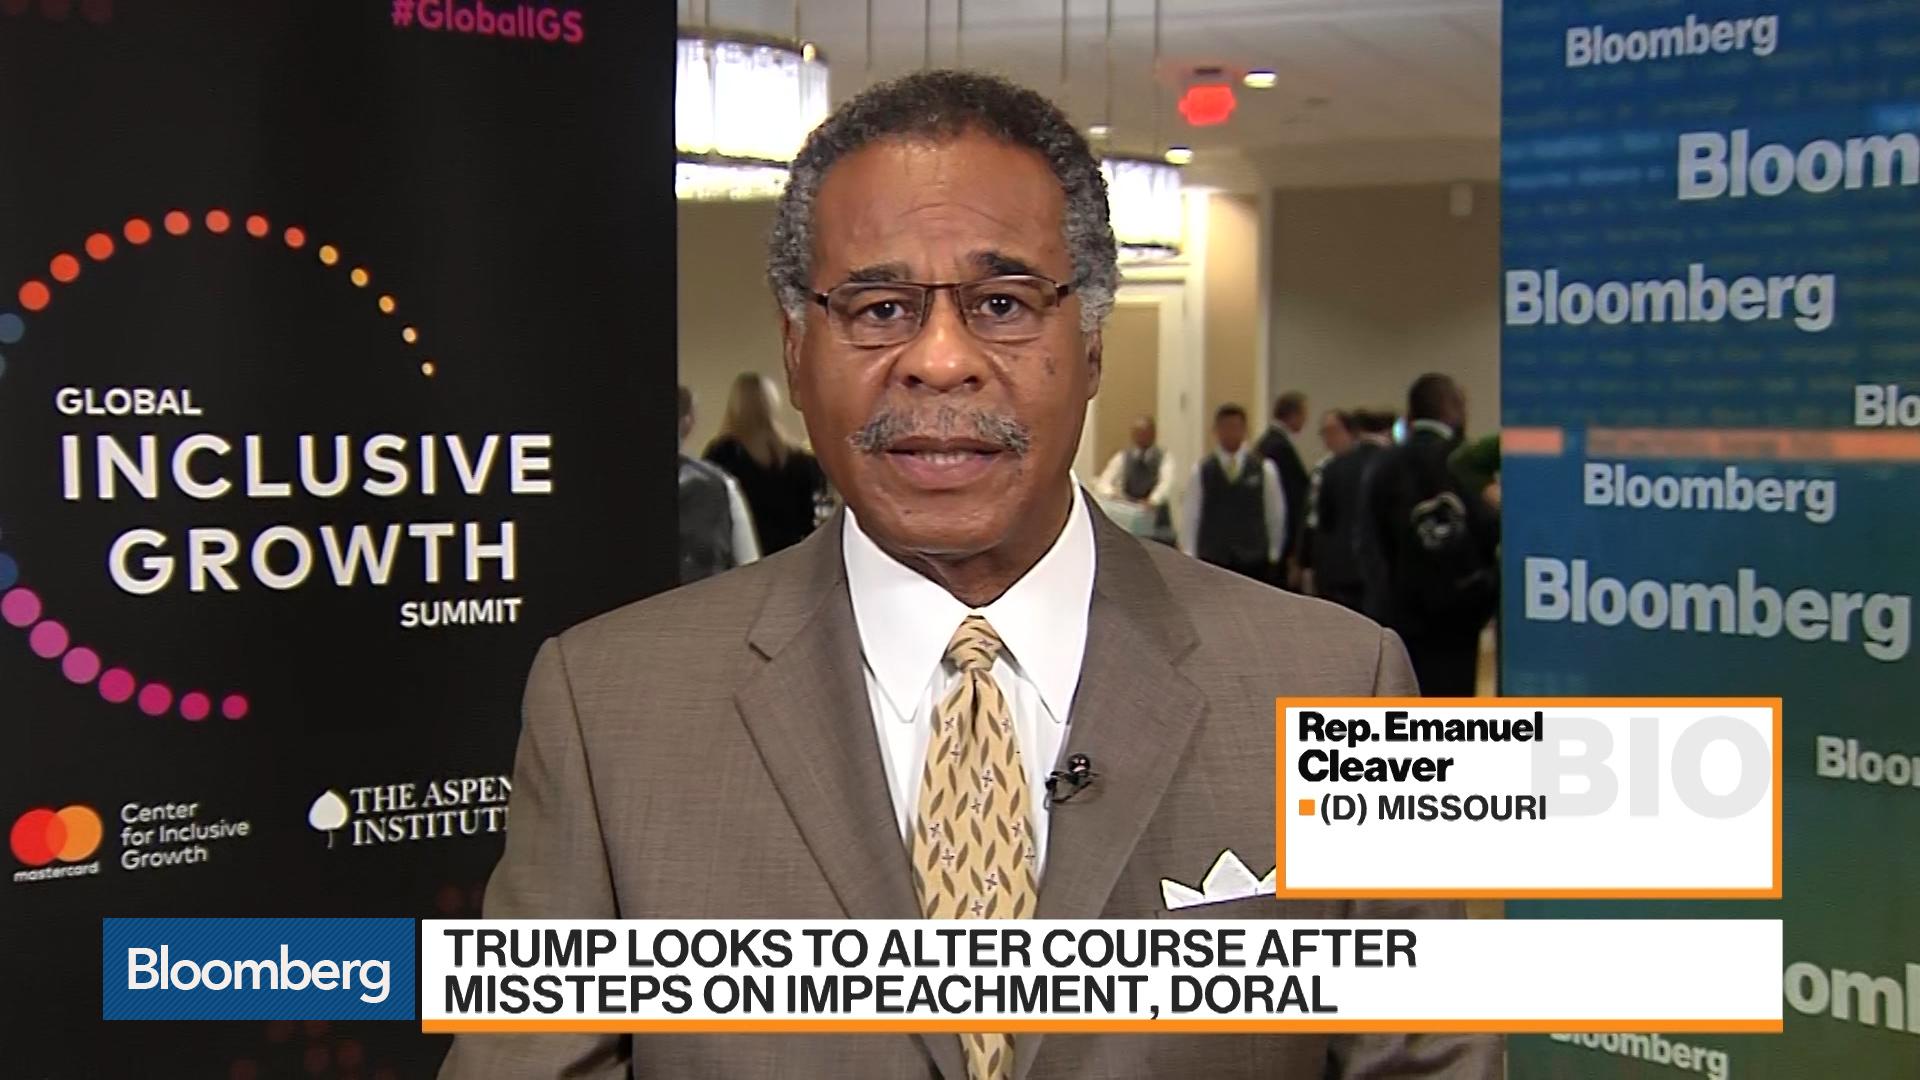 Impeachment Inquiry Better Off Behind Closed Doors: Rep. Emanuel